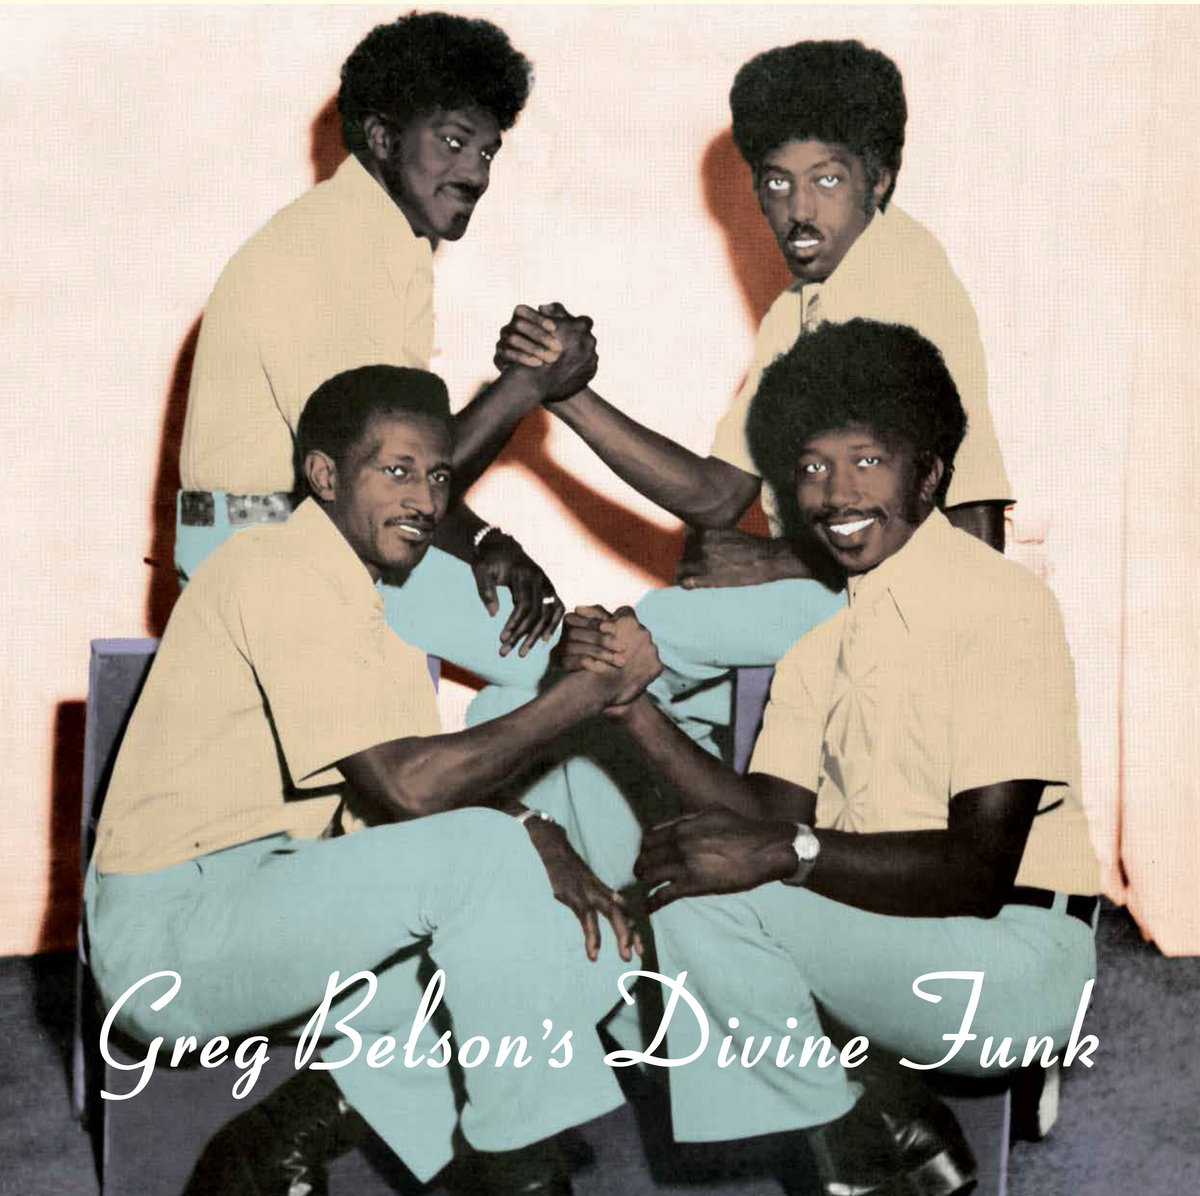 Greg Belson's Devine Funk